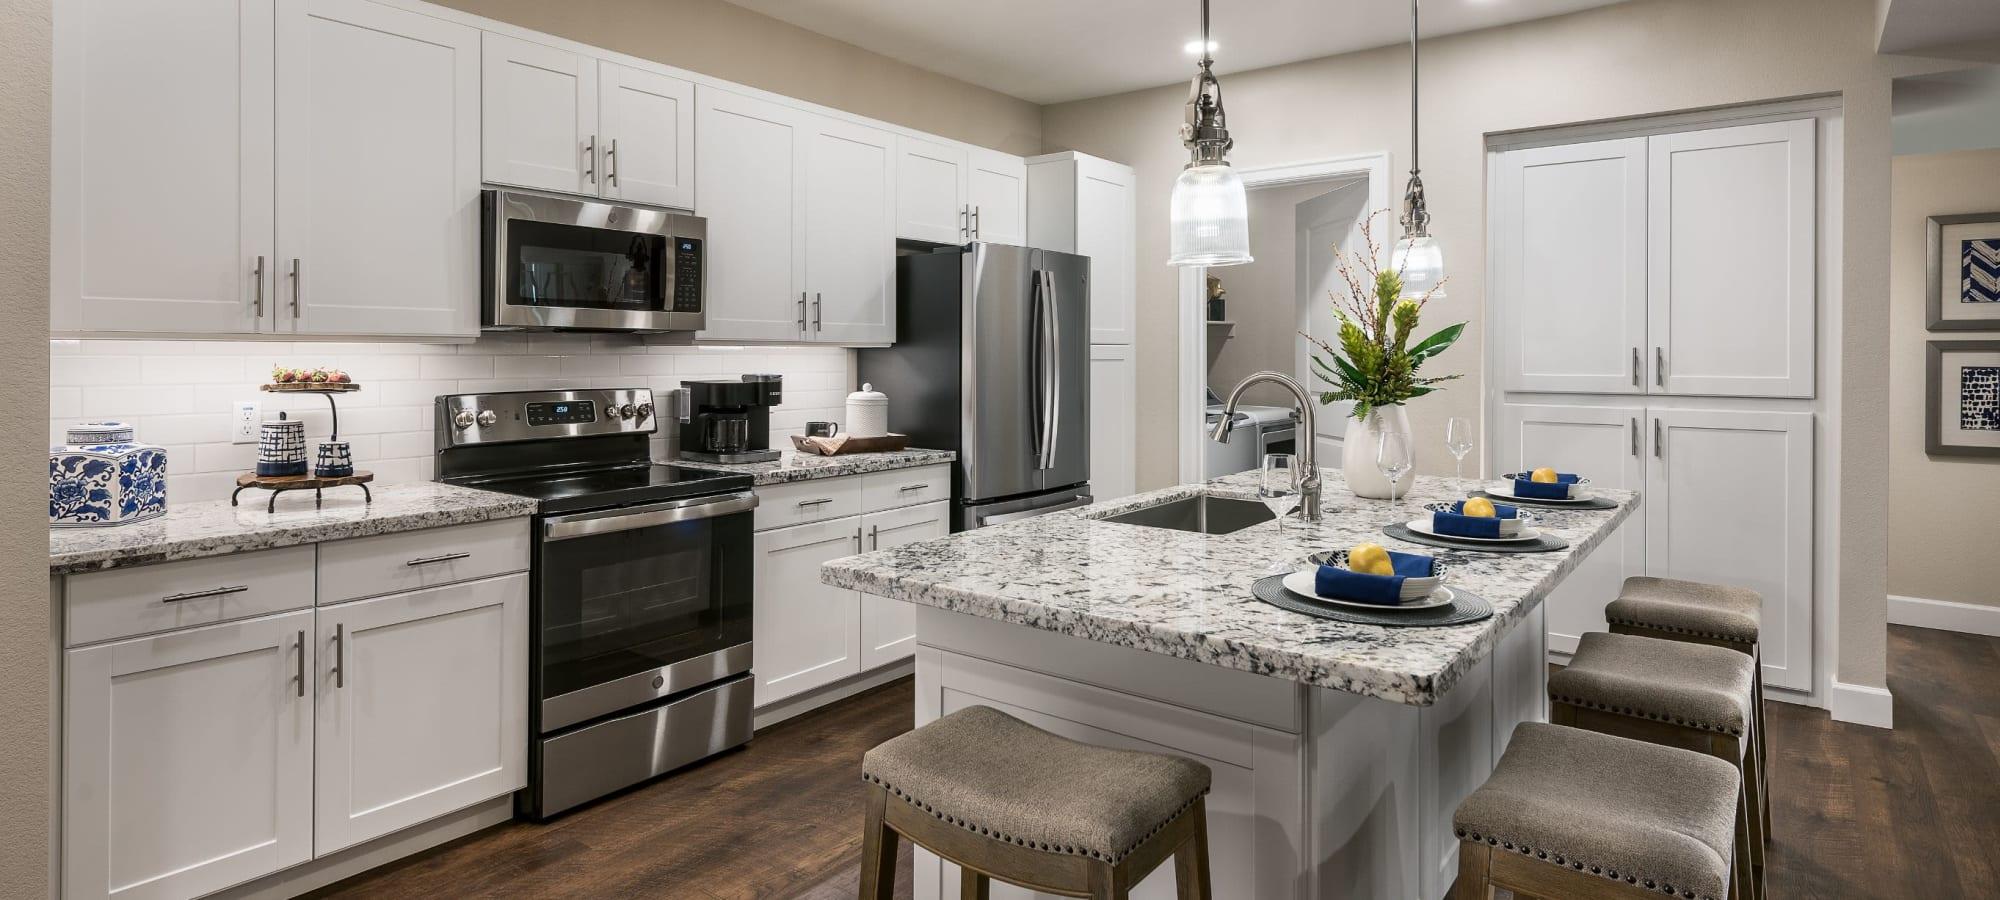 Modern kitchen with an island at San Artes in Scottsdale, Arizona